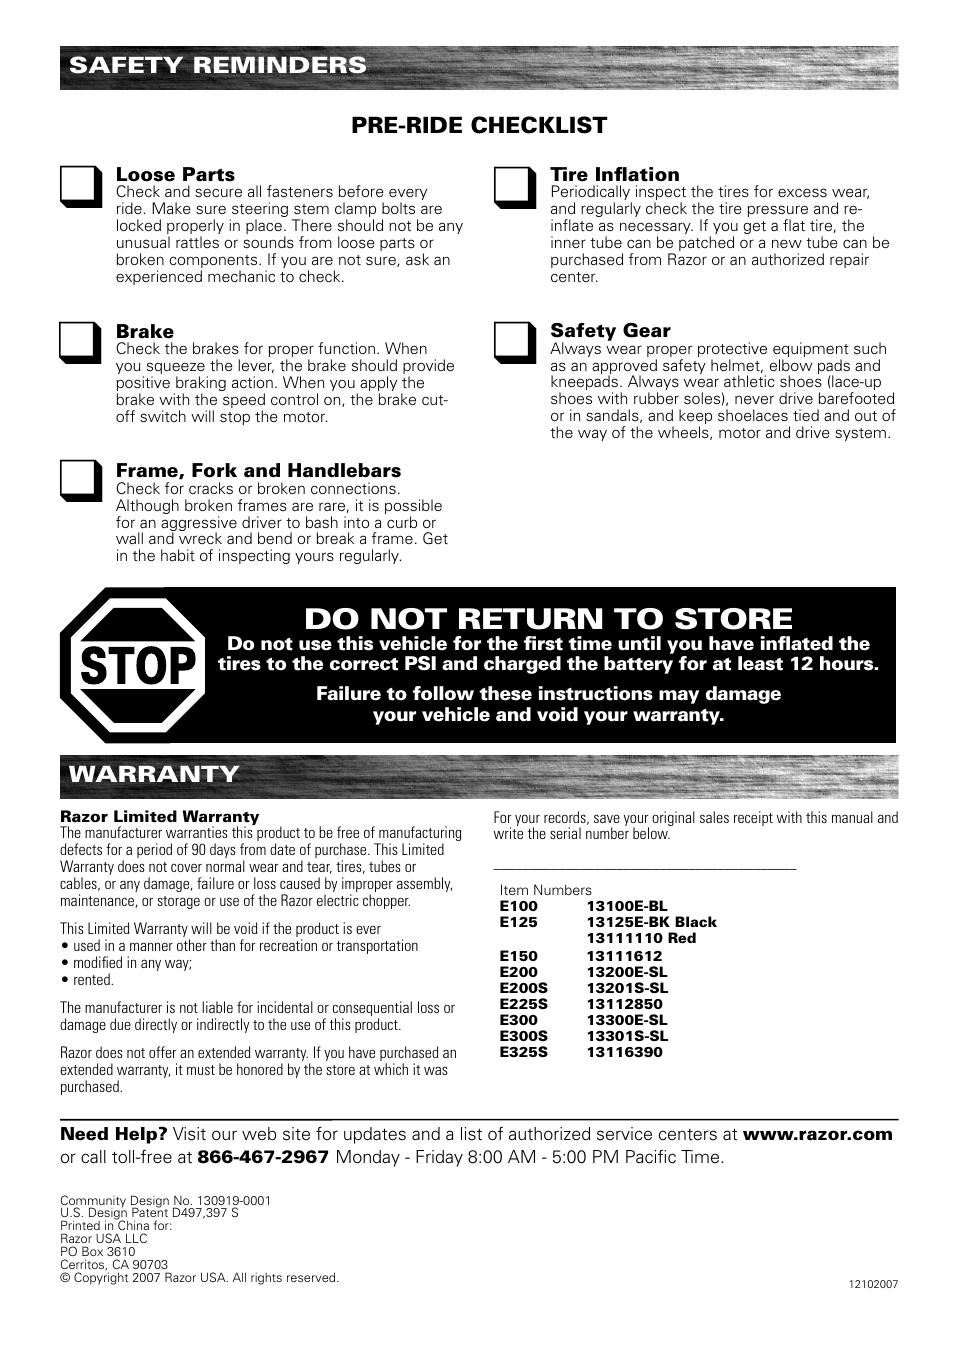 Razor E300 Control Box Wiring Diagram Chopper Battery E200 Do Not Return To Store Warranty Safety Reminders User E